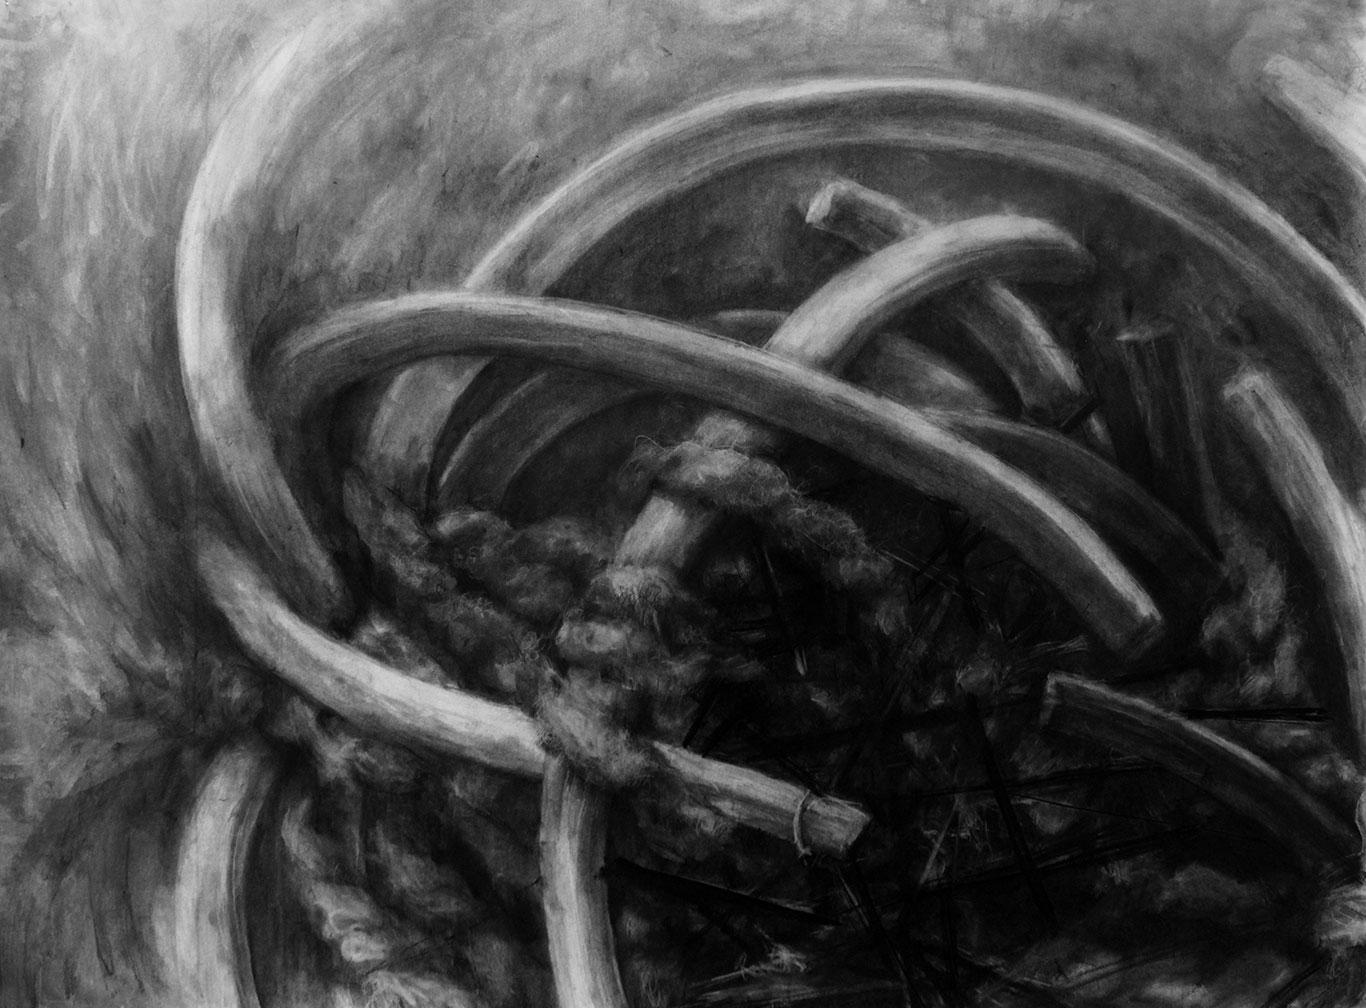 Charcoal Drawing by Juwon Joon